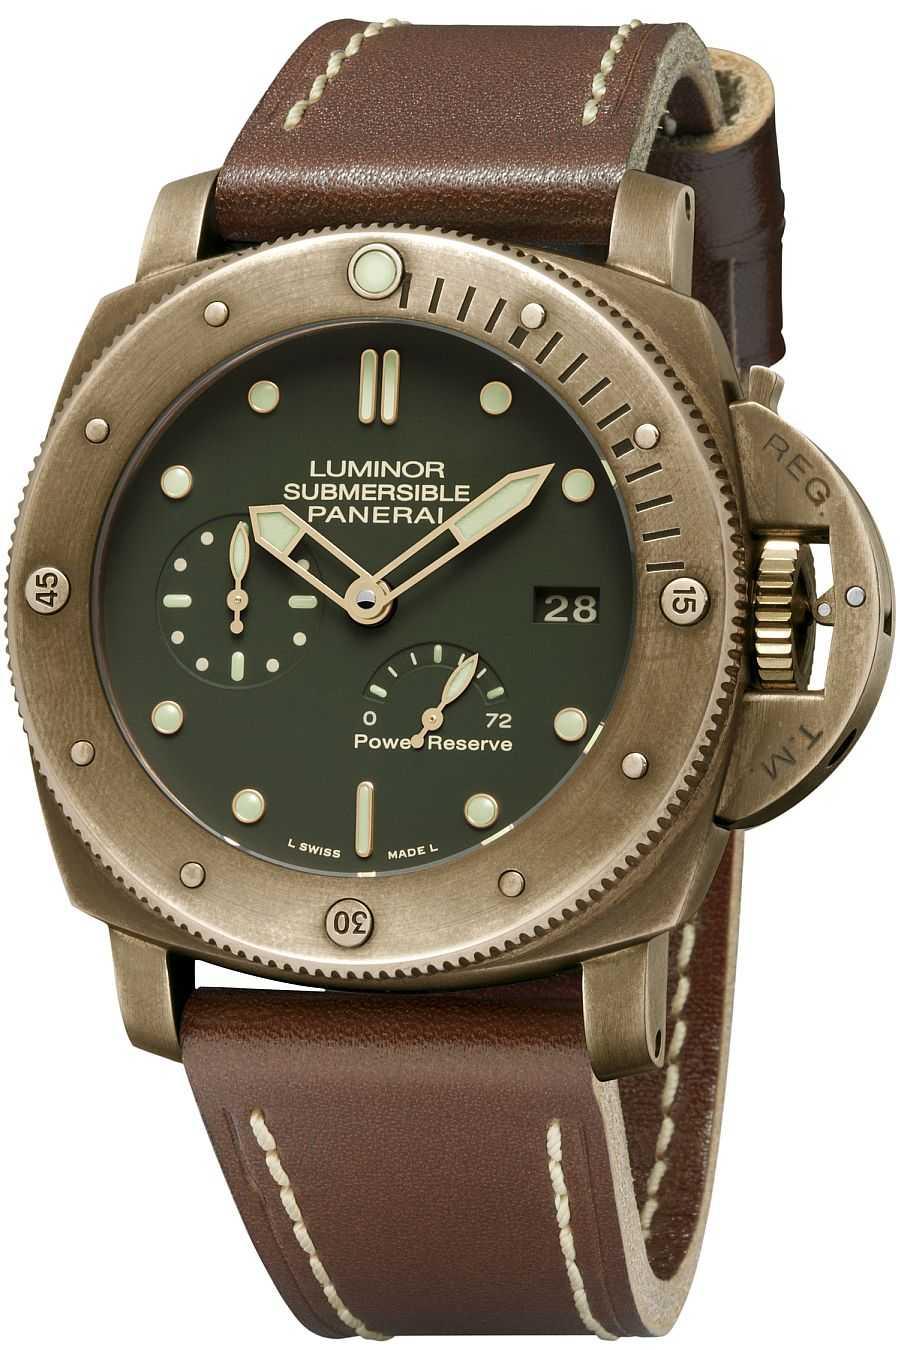 Bronze-Uhr aus dem Hause Panerai: Submersible 1950 3 Days Power Reserve Automatic Bronzo